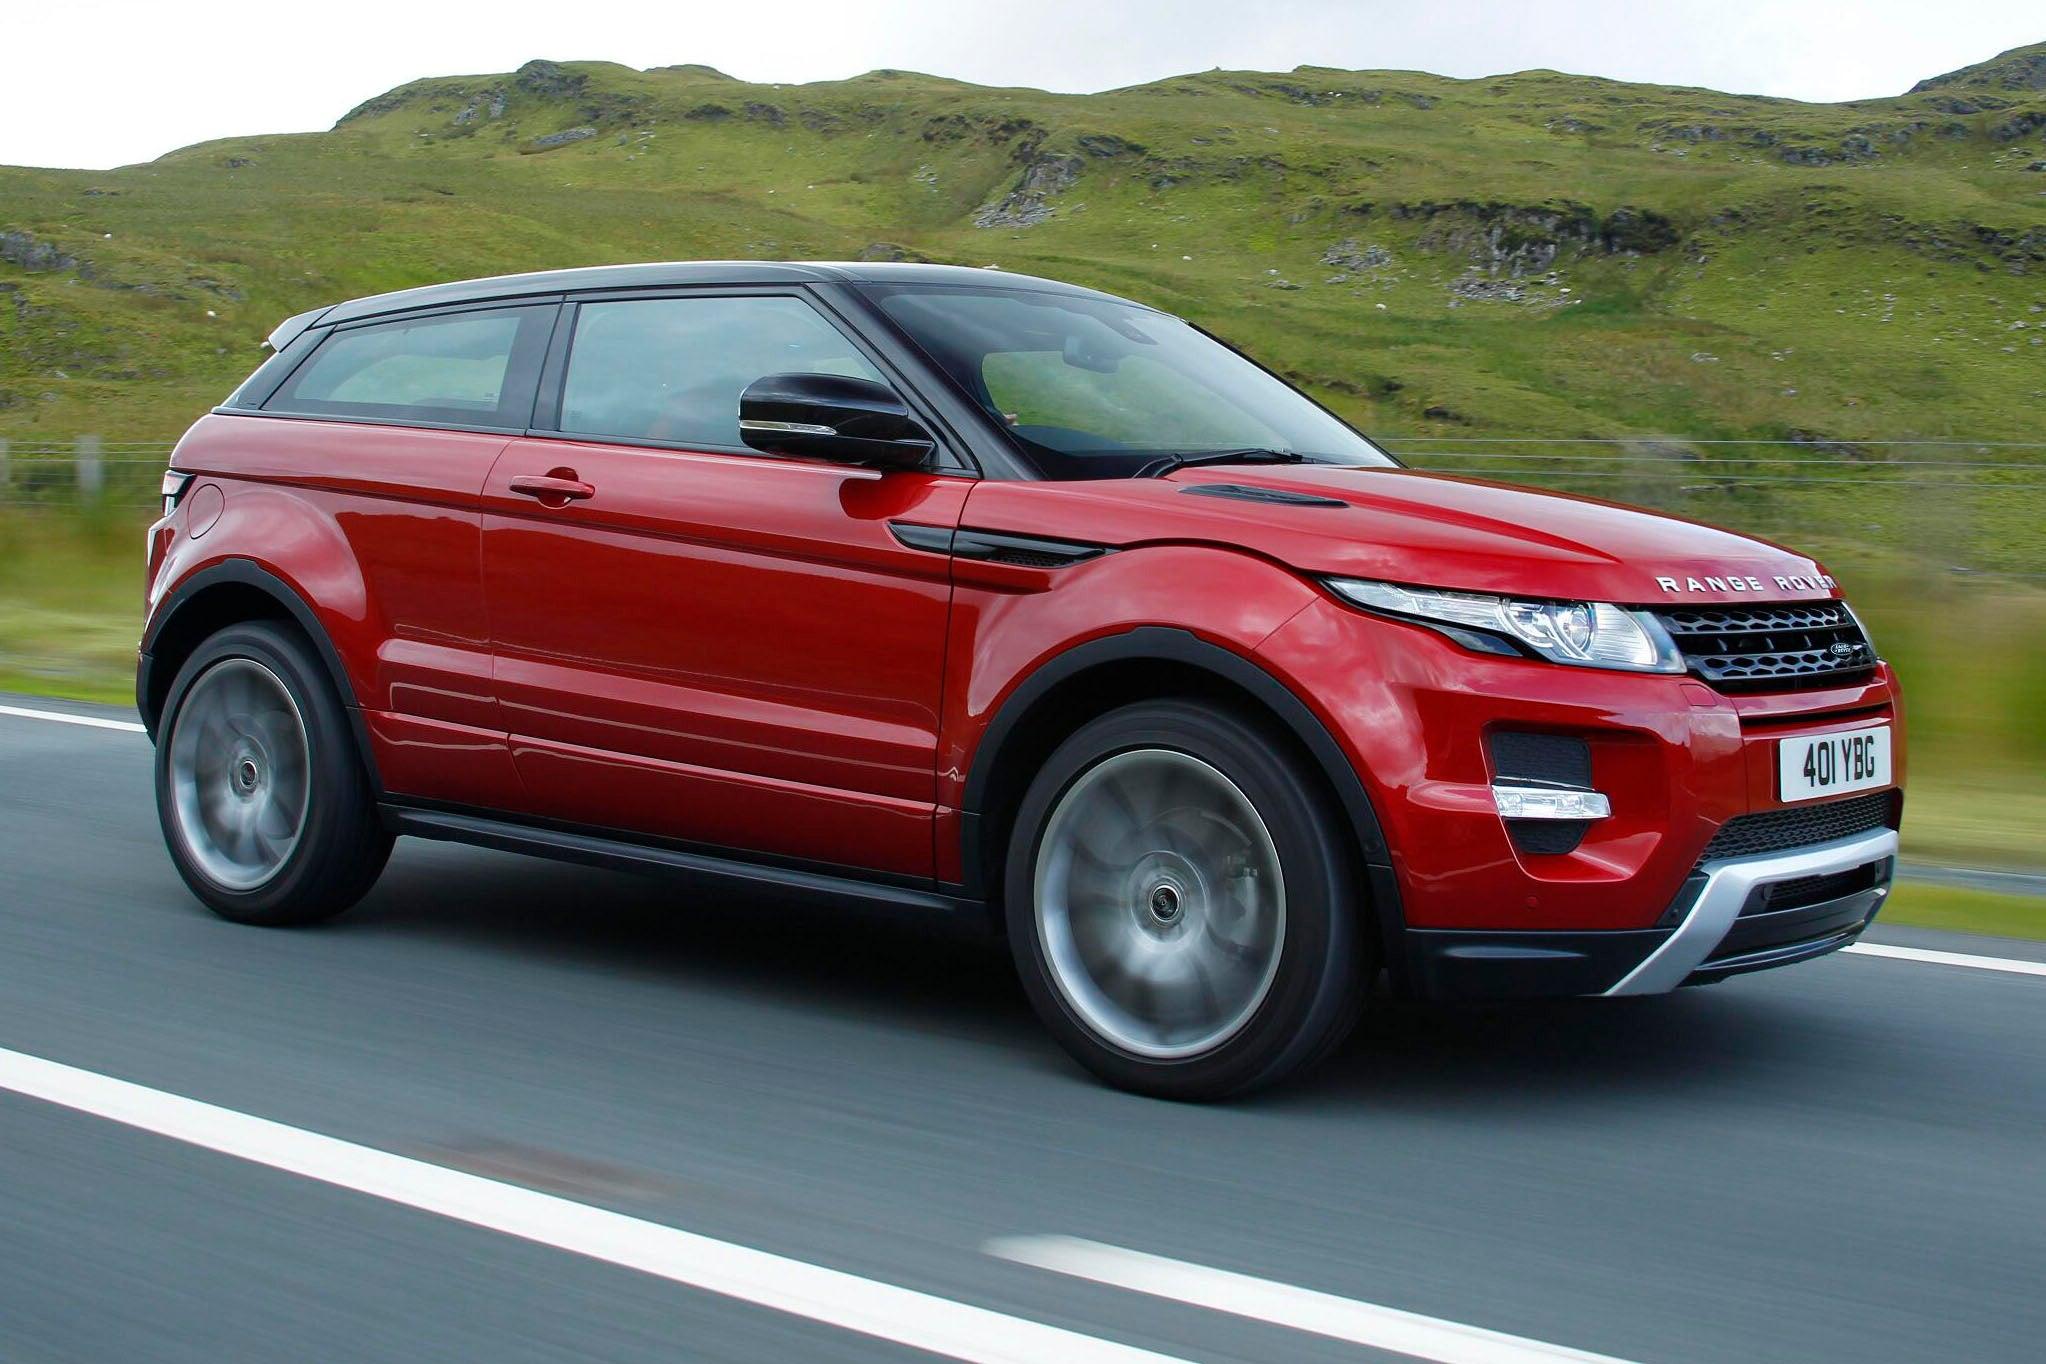 Range Rover Evoque Coupe on road